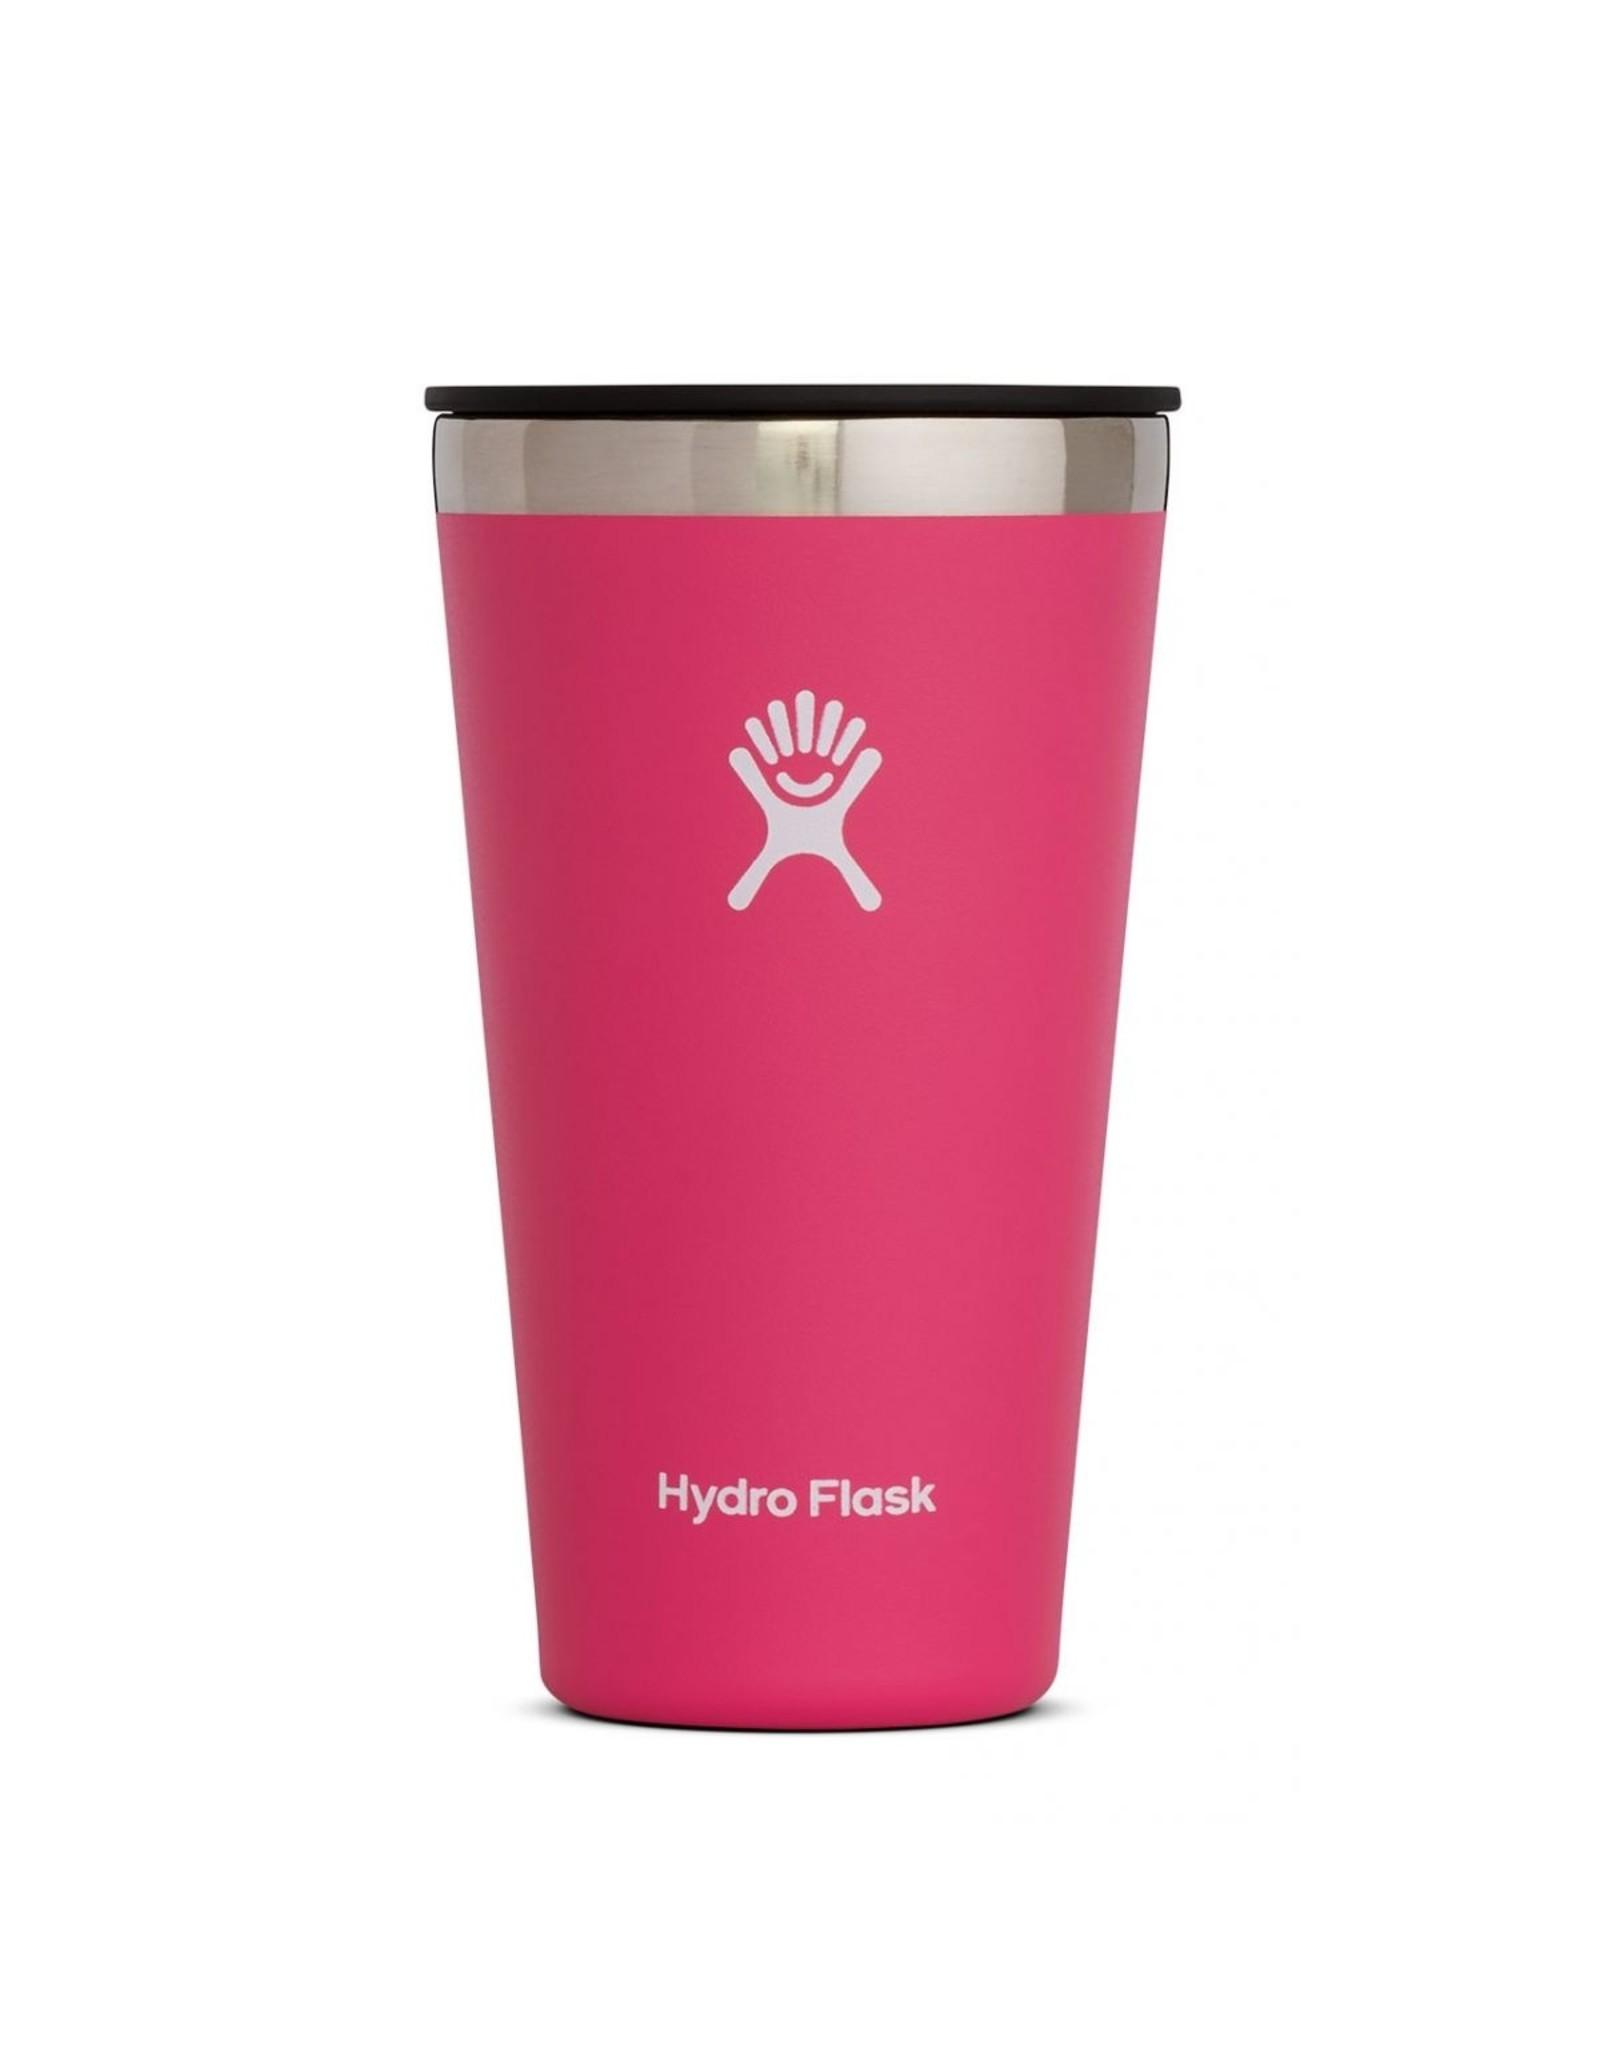 Hydro Flask Hydro Flask 16oz Tumbler Watermelon